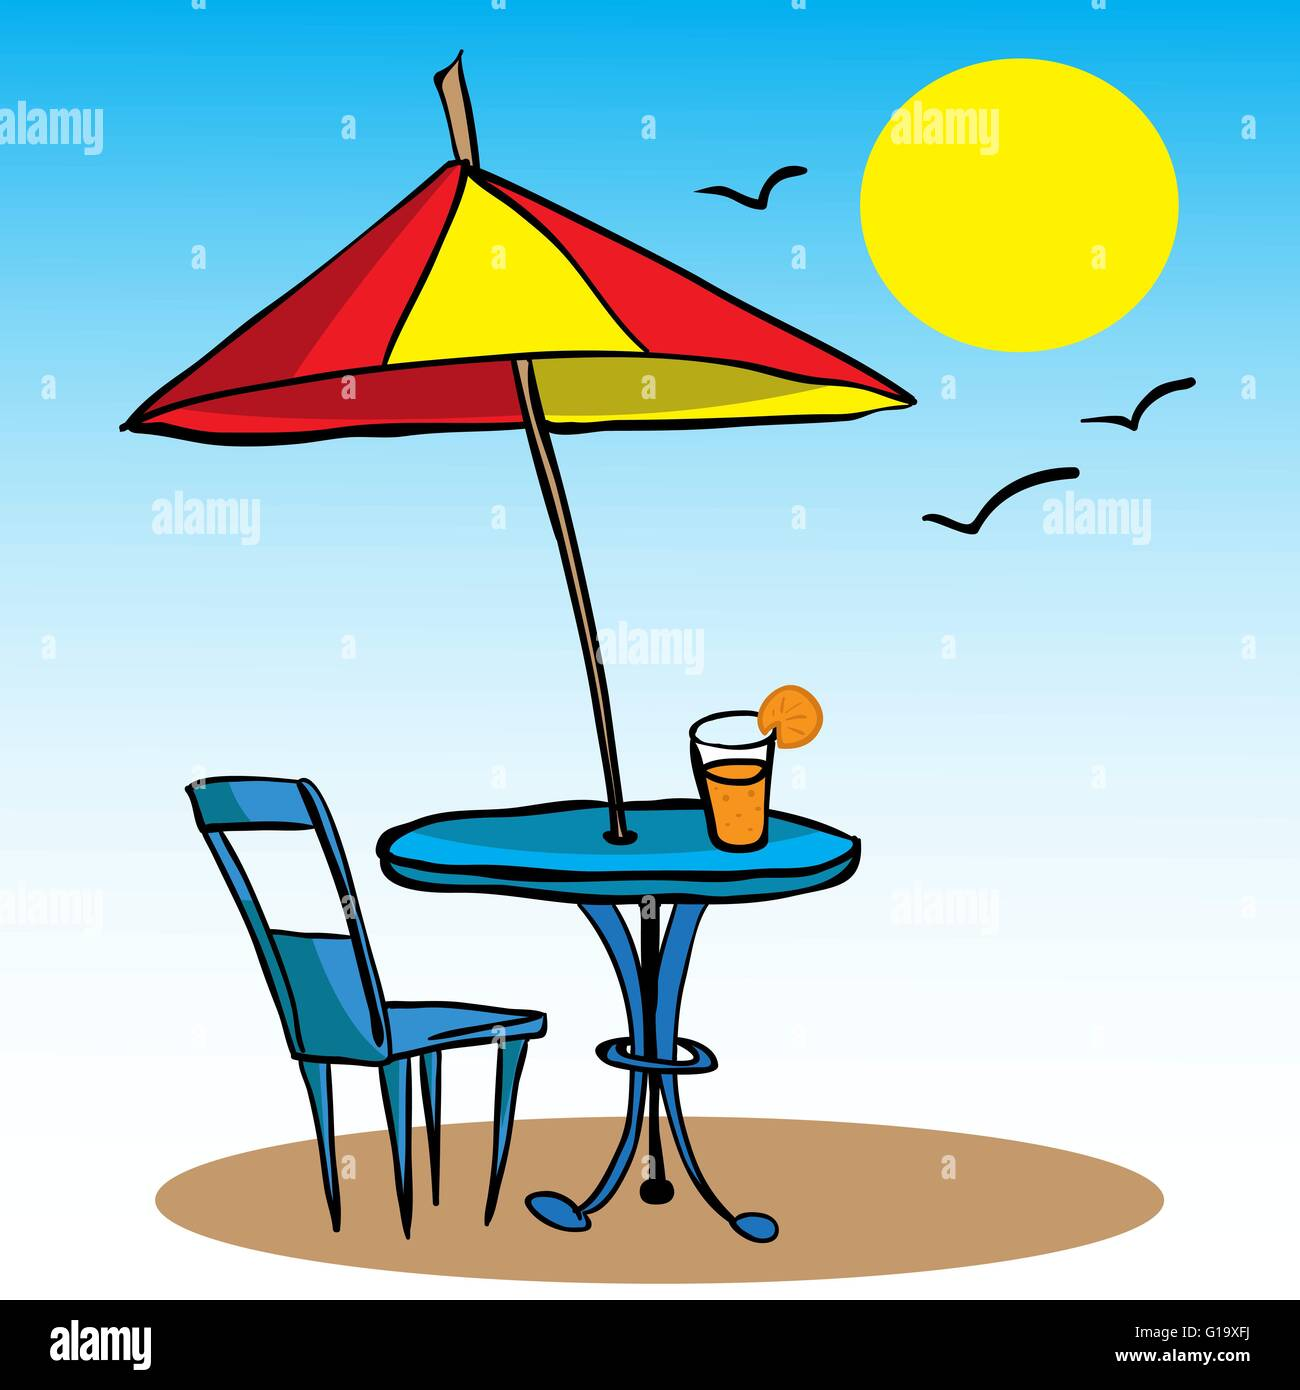 Stock Vector   Beach Umbrella, Table, Chair And Juice Cartoon Doodle